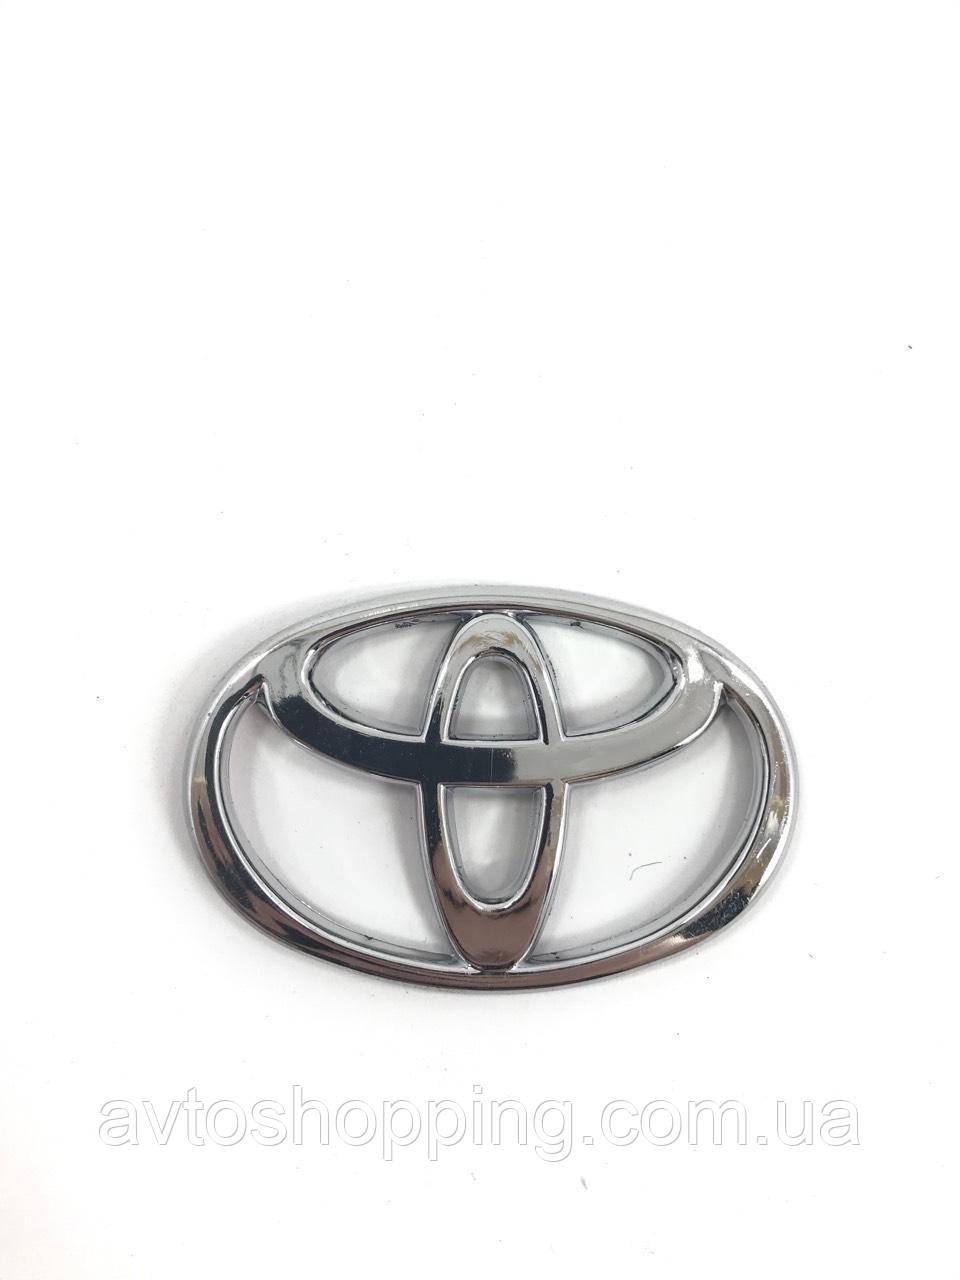 Значок эмблема на капот,багажник Тойота Toyota 74*50 мм